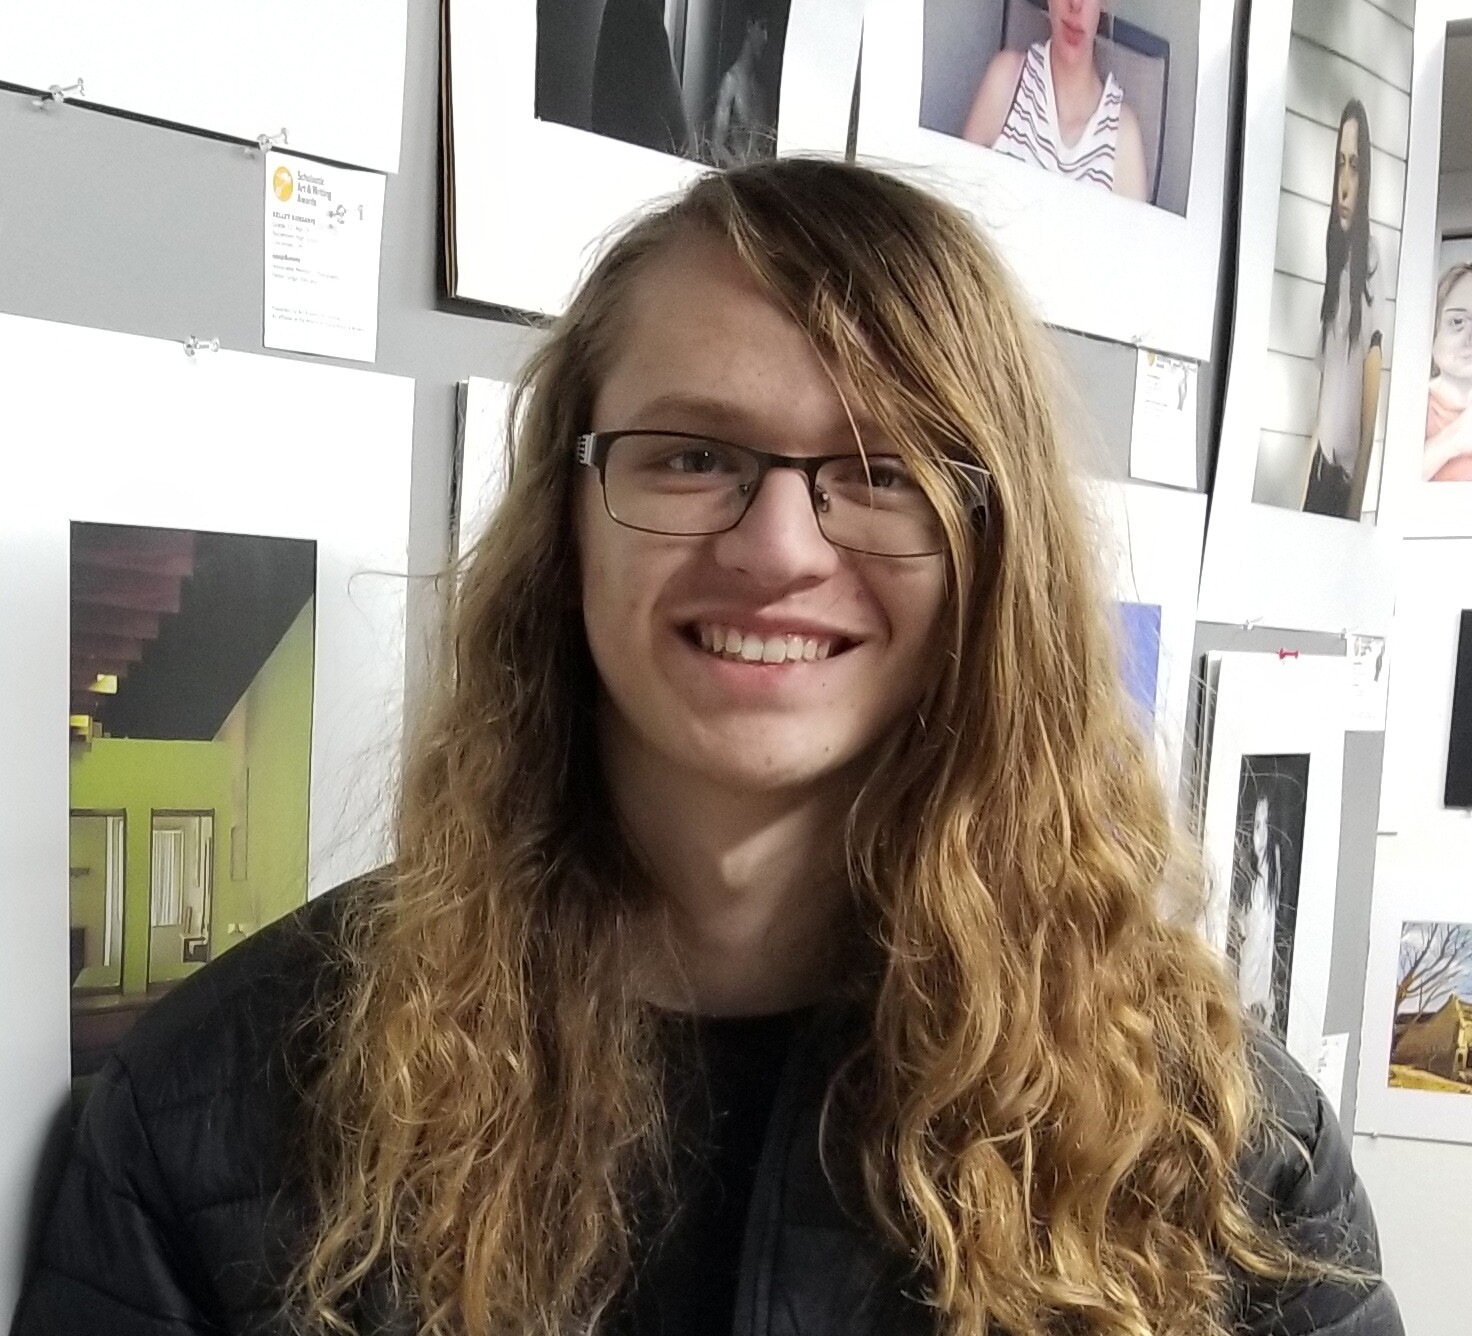 Jordan Griffin, Simon Kenton High School